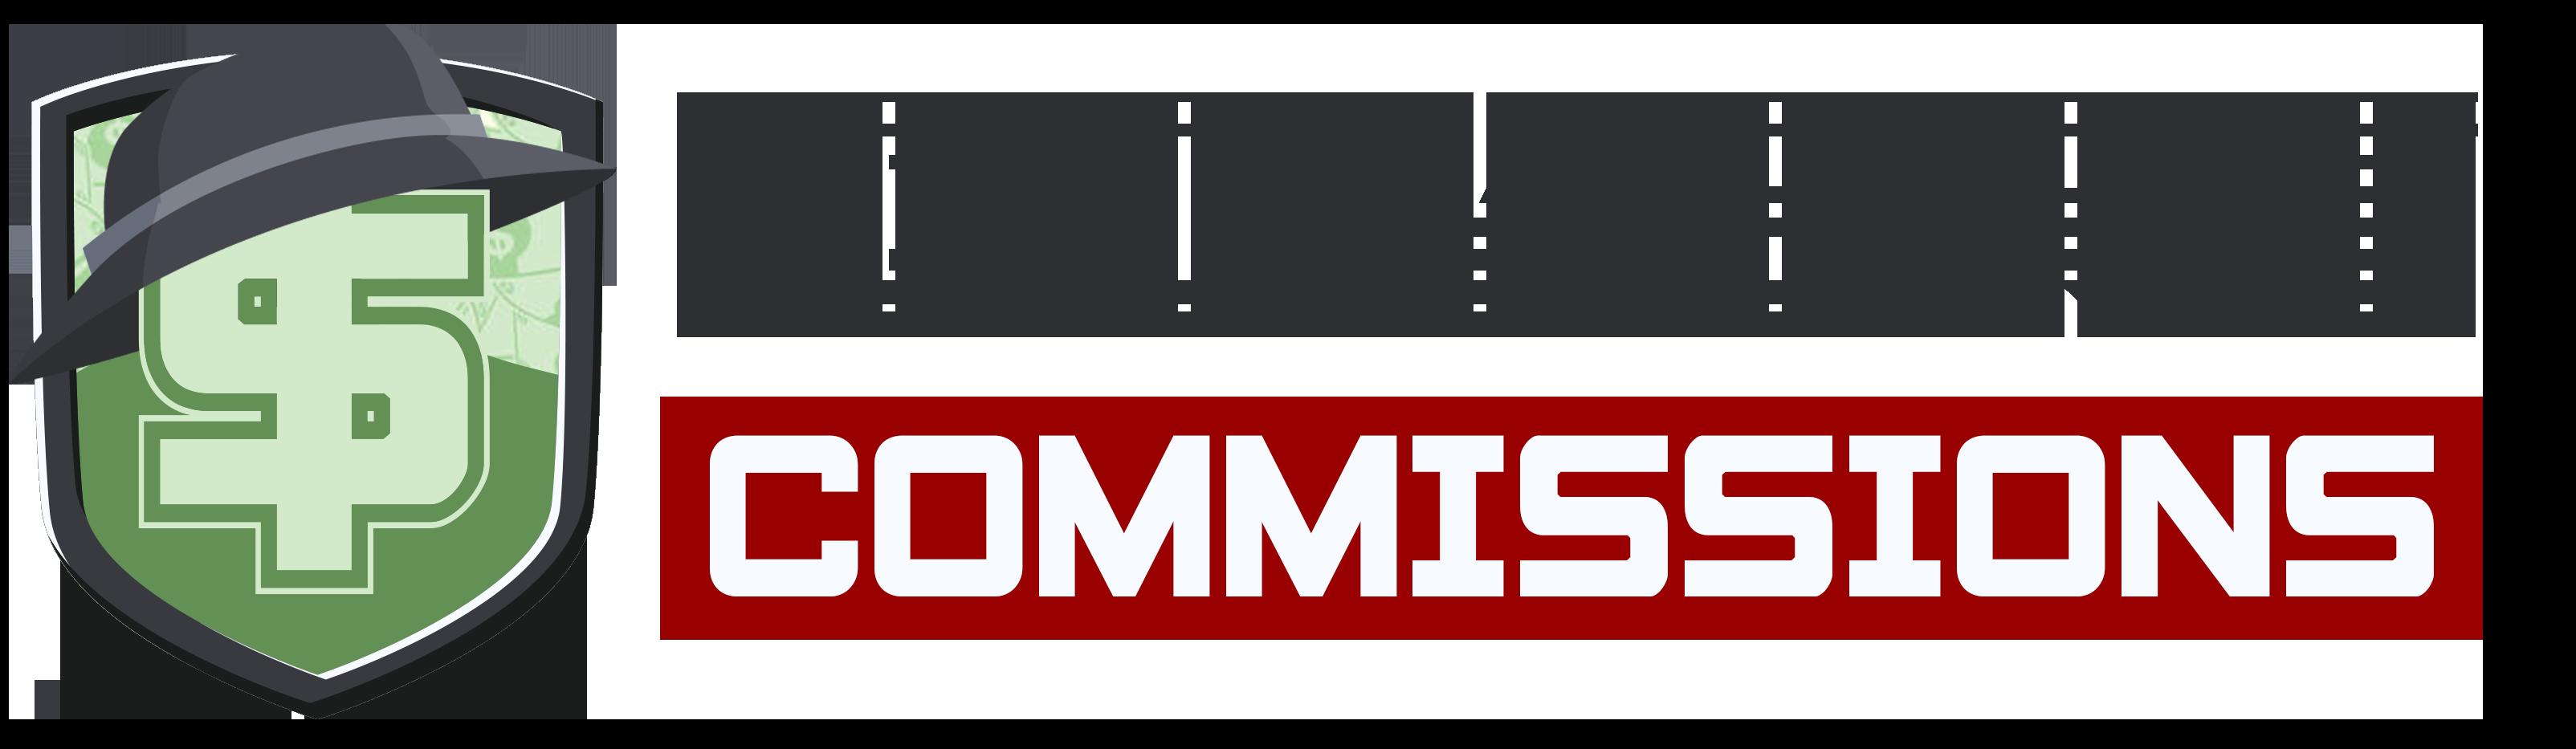 Convert Commissions deal